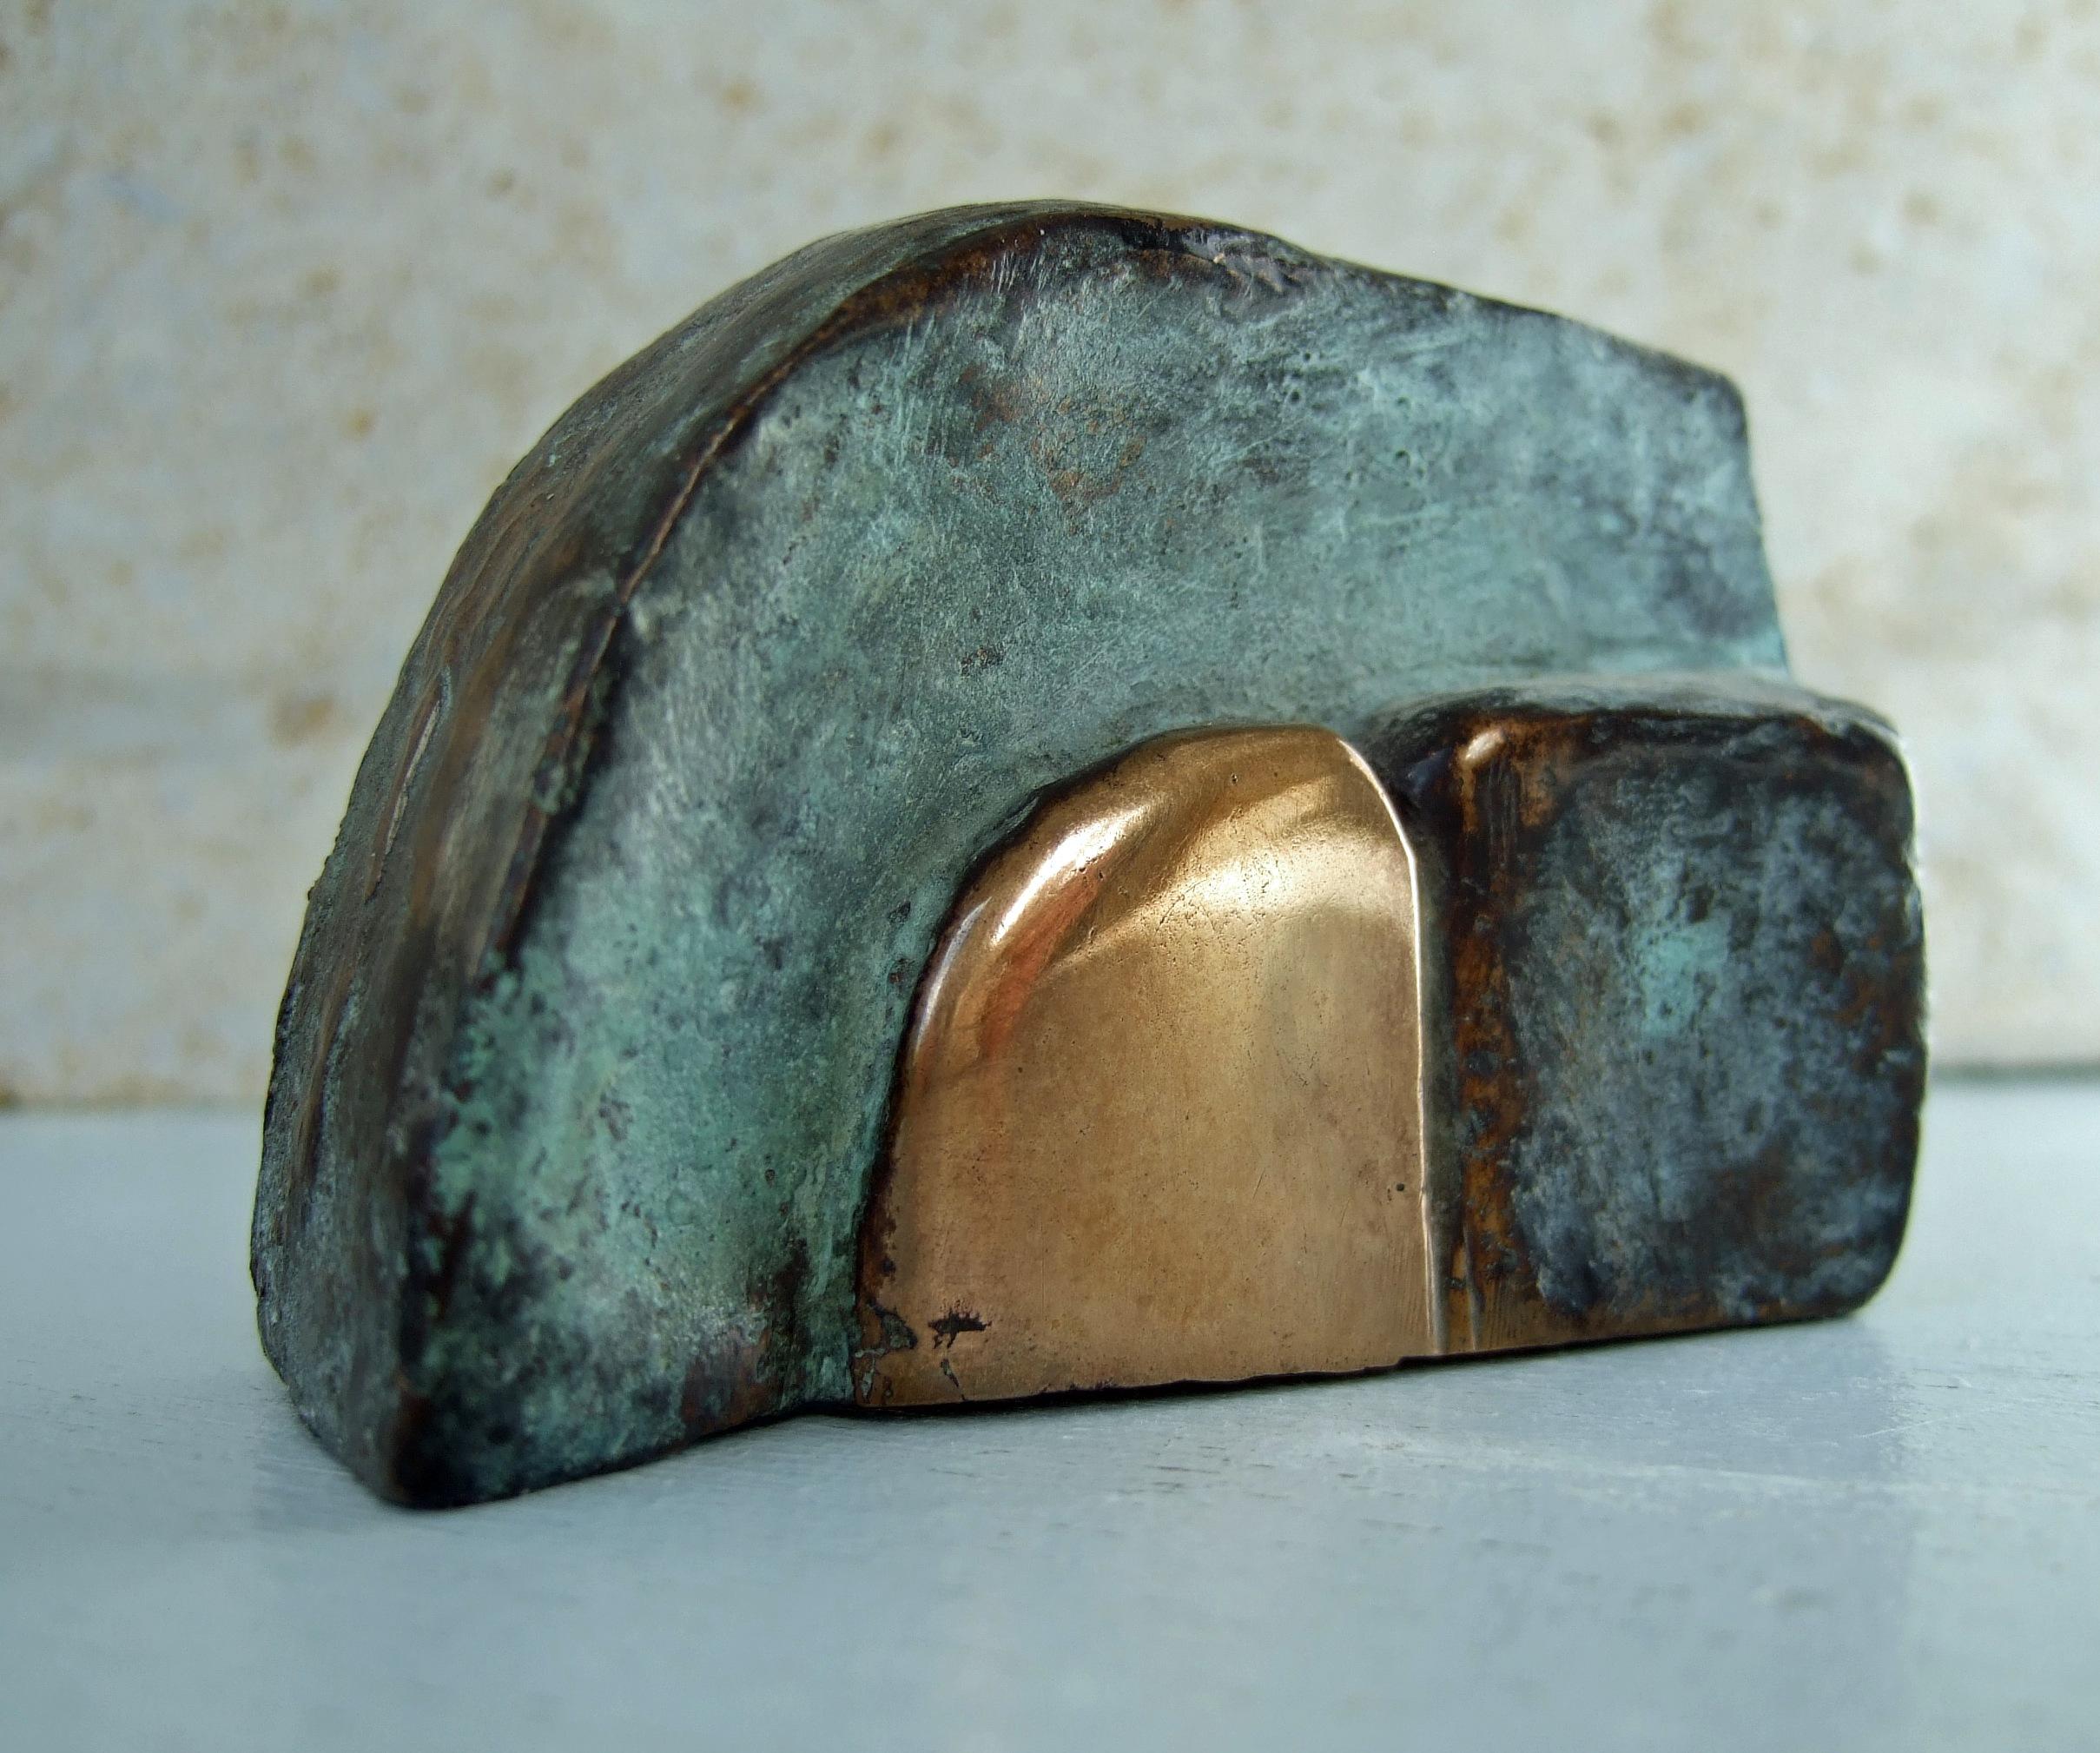 Marina v.d. kooi  gesloten  brons  4 x 7 cm. e.  320 00